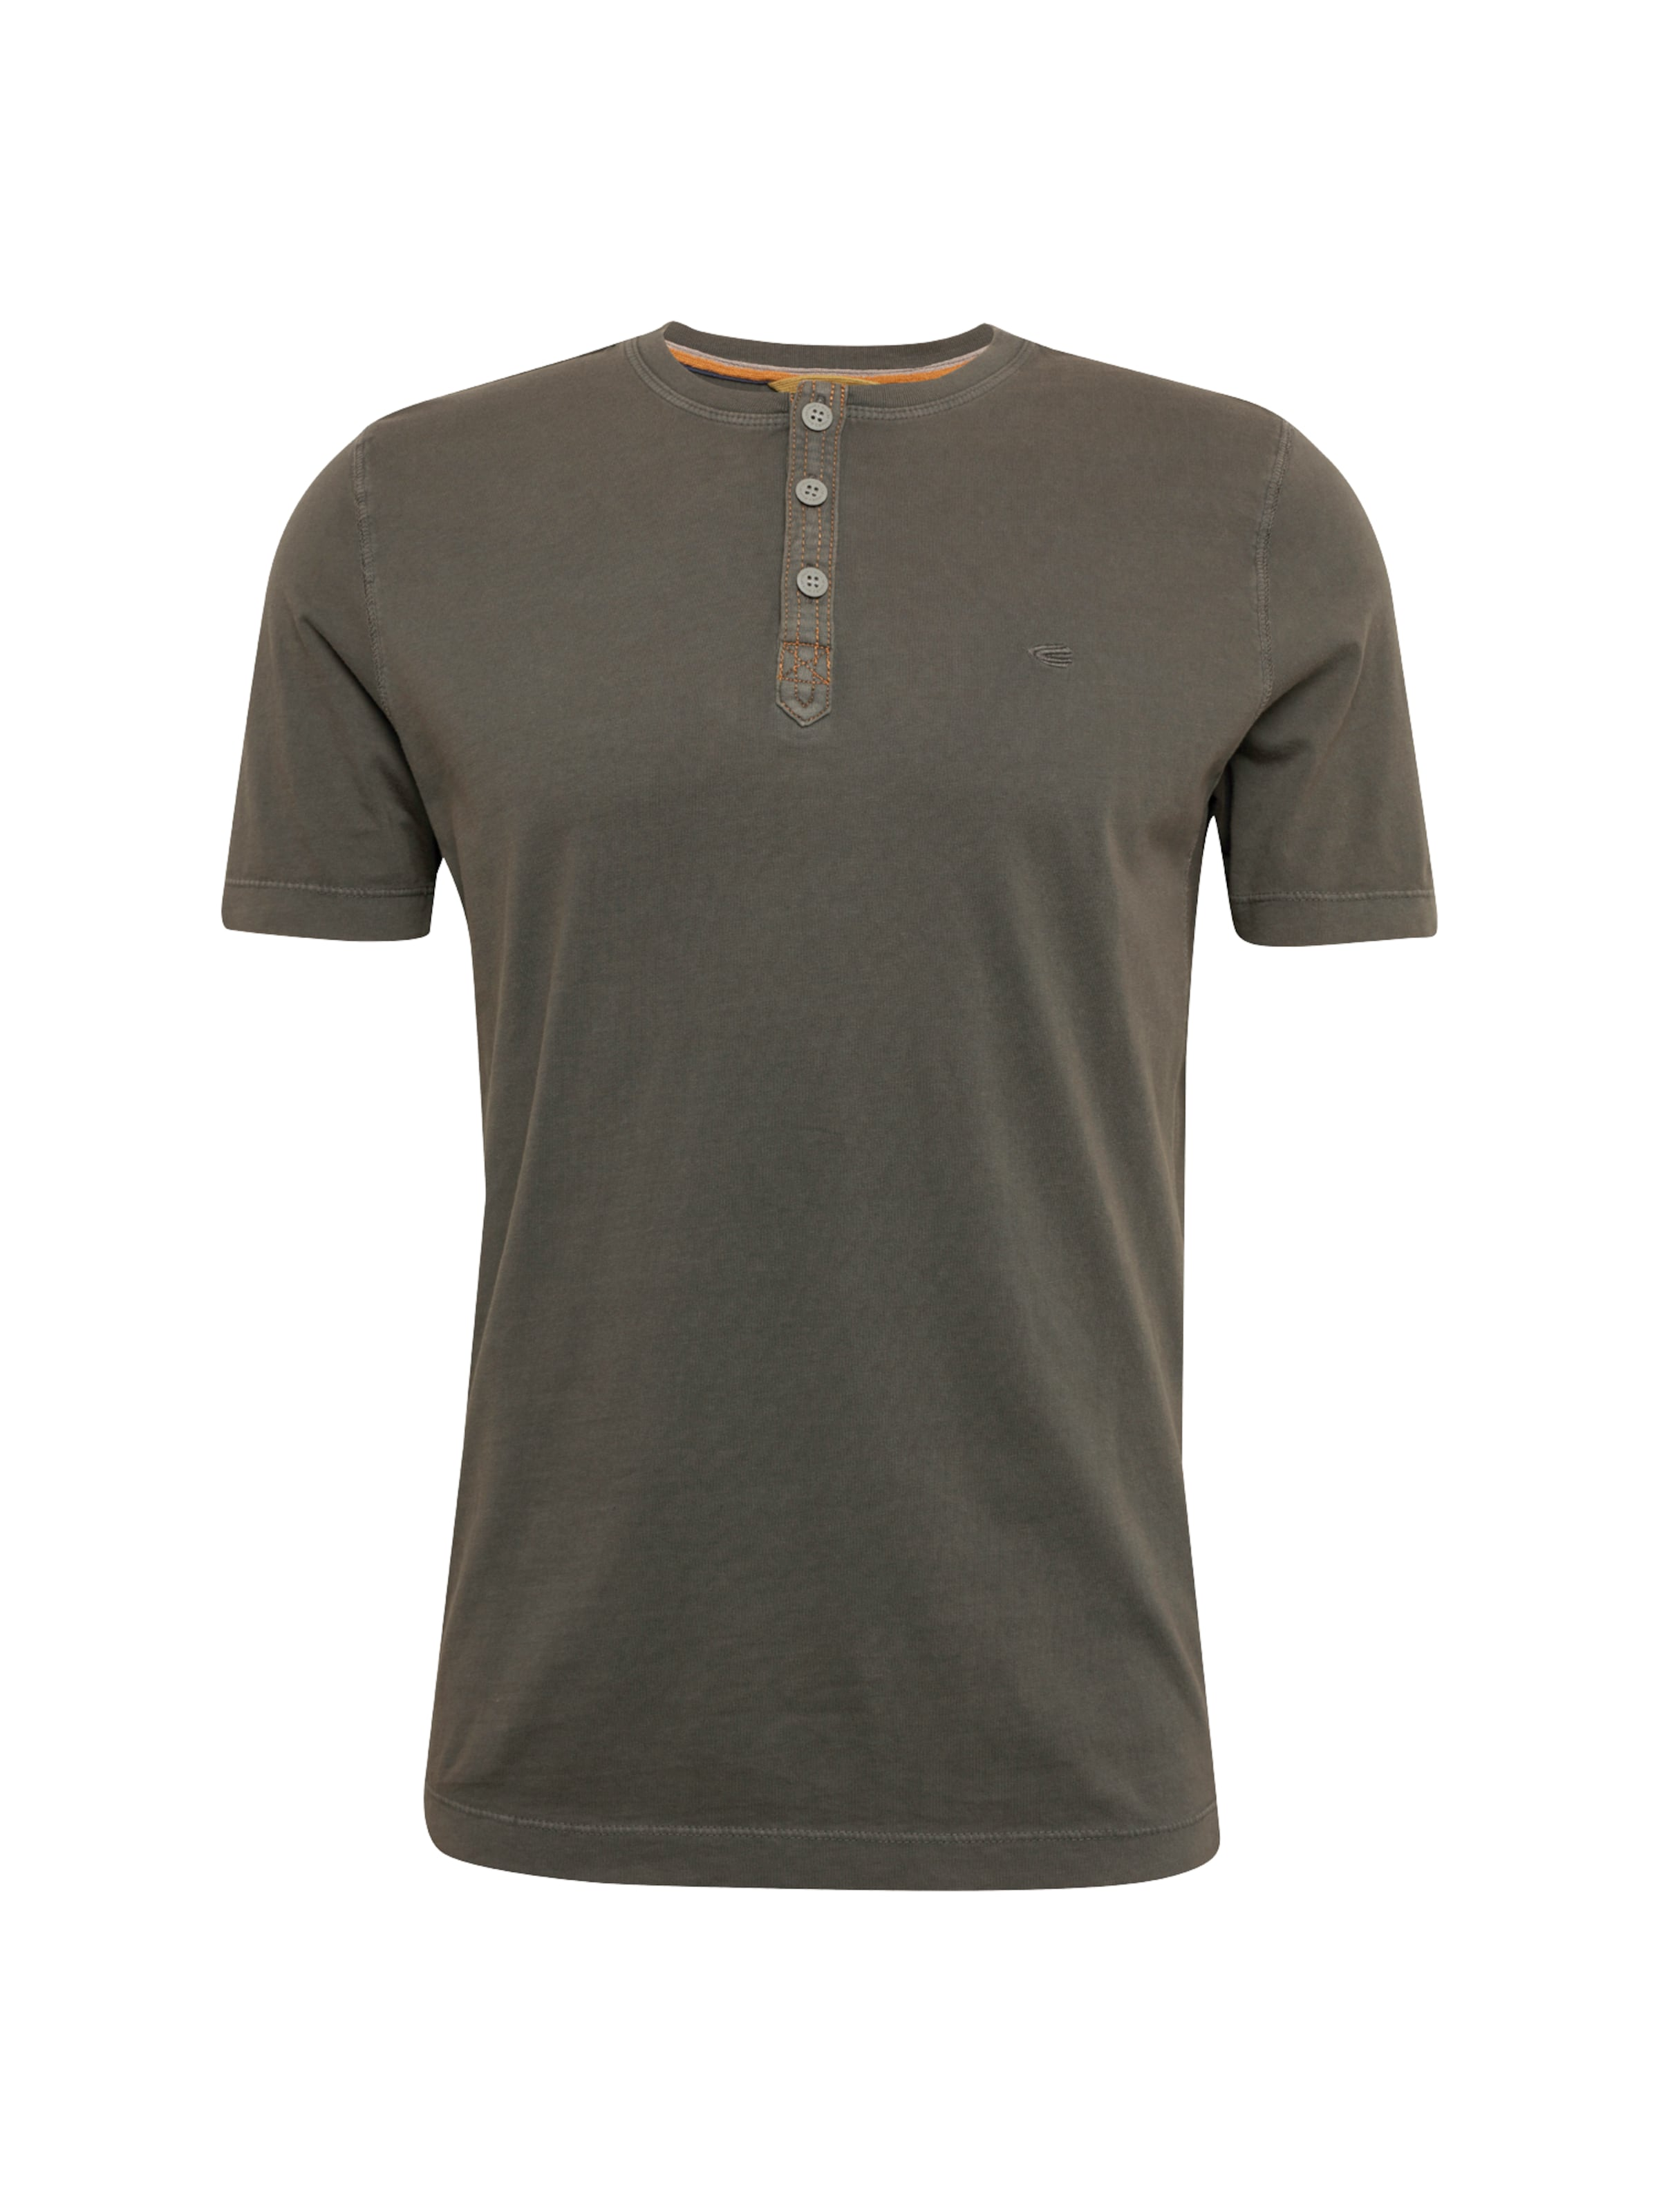 shirt In Dunkelgrau Camel T Active HDWEIY2e9